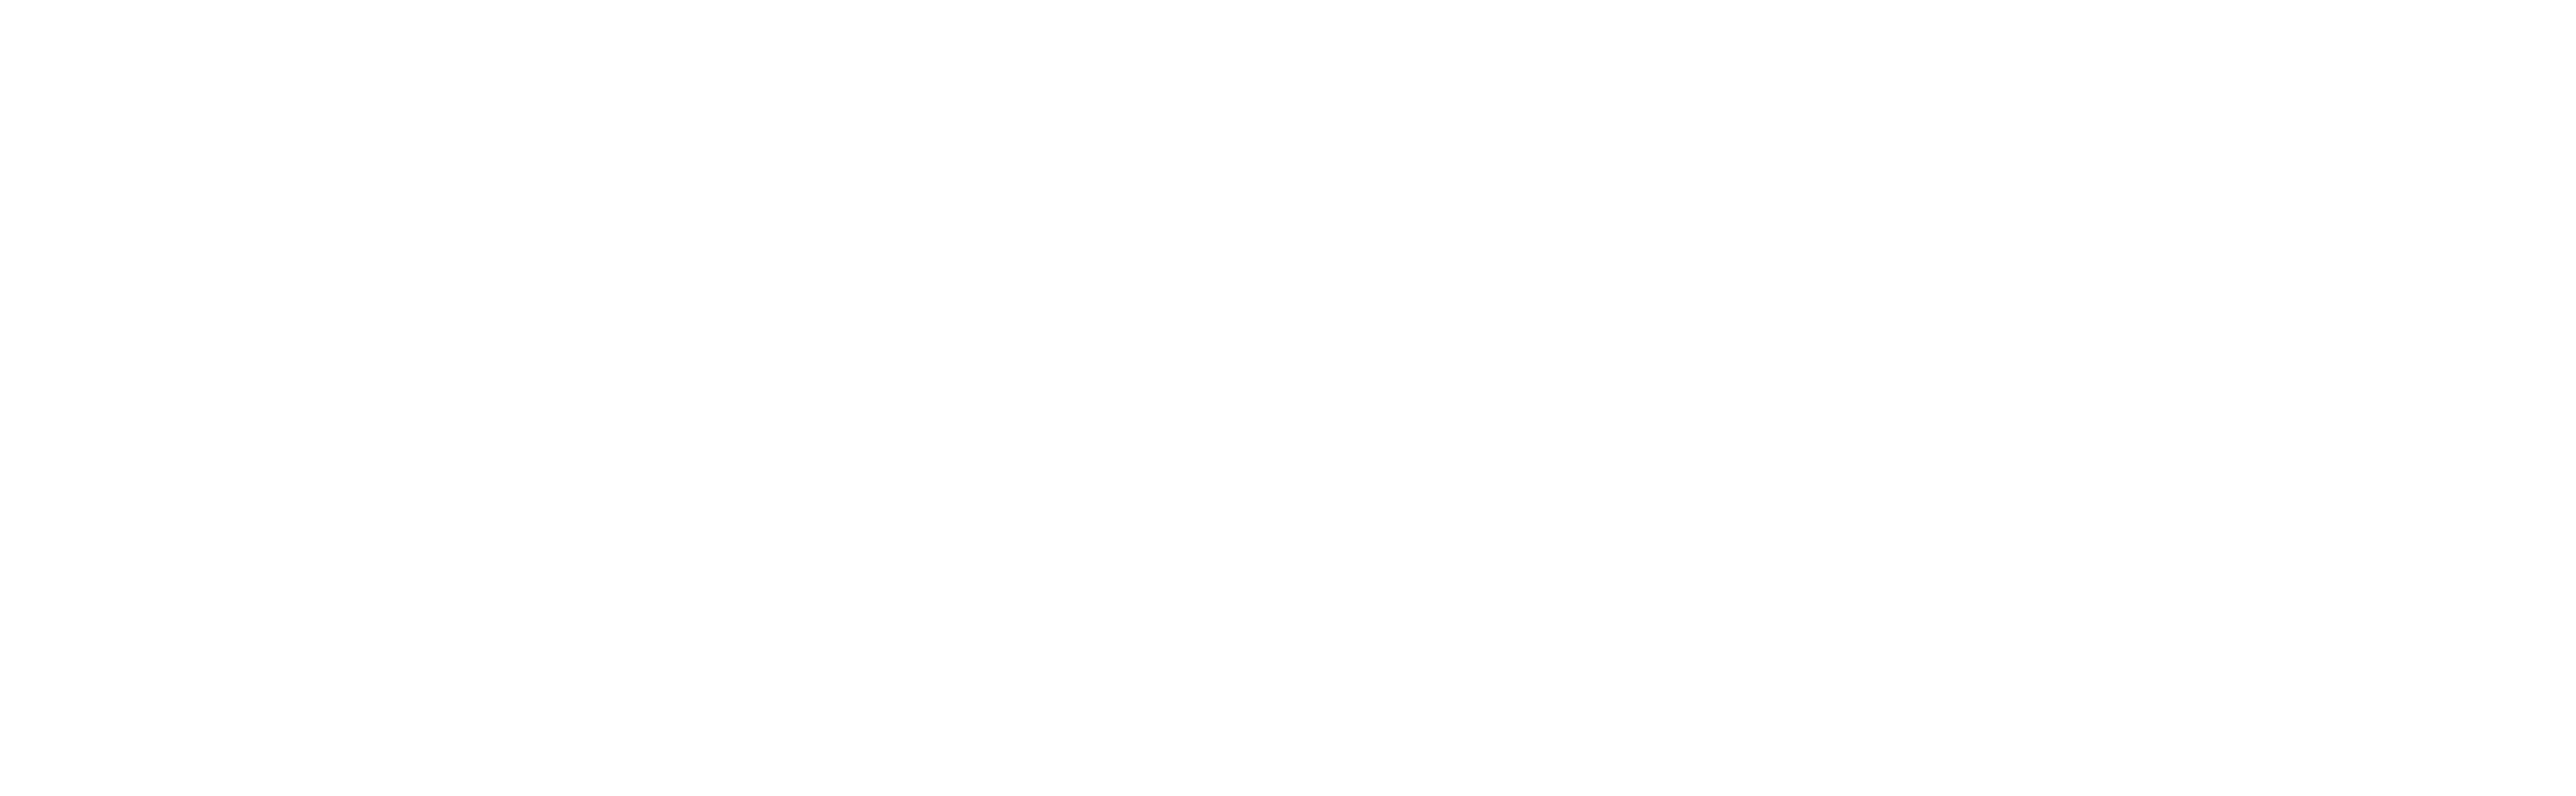 The Maddox